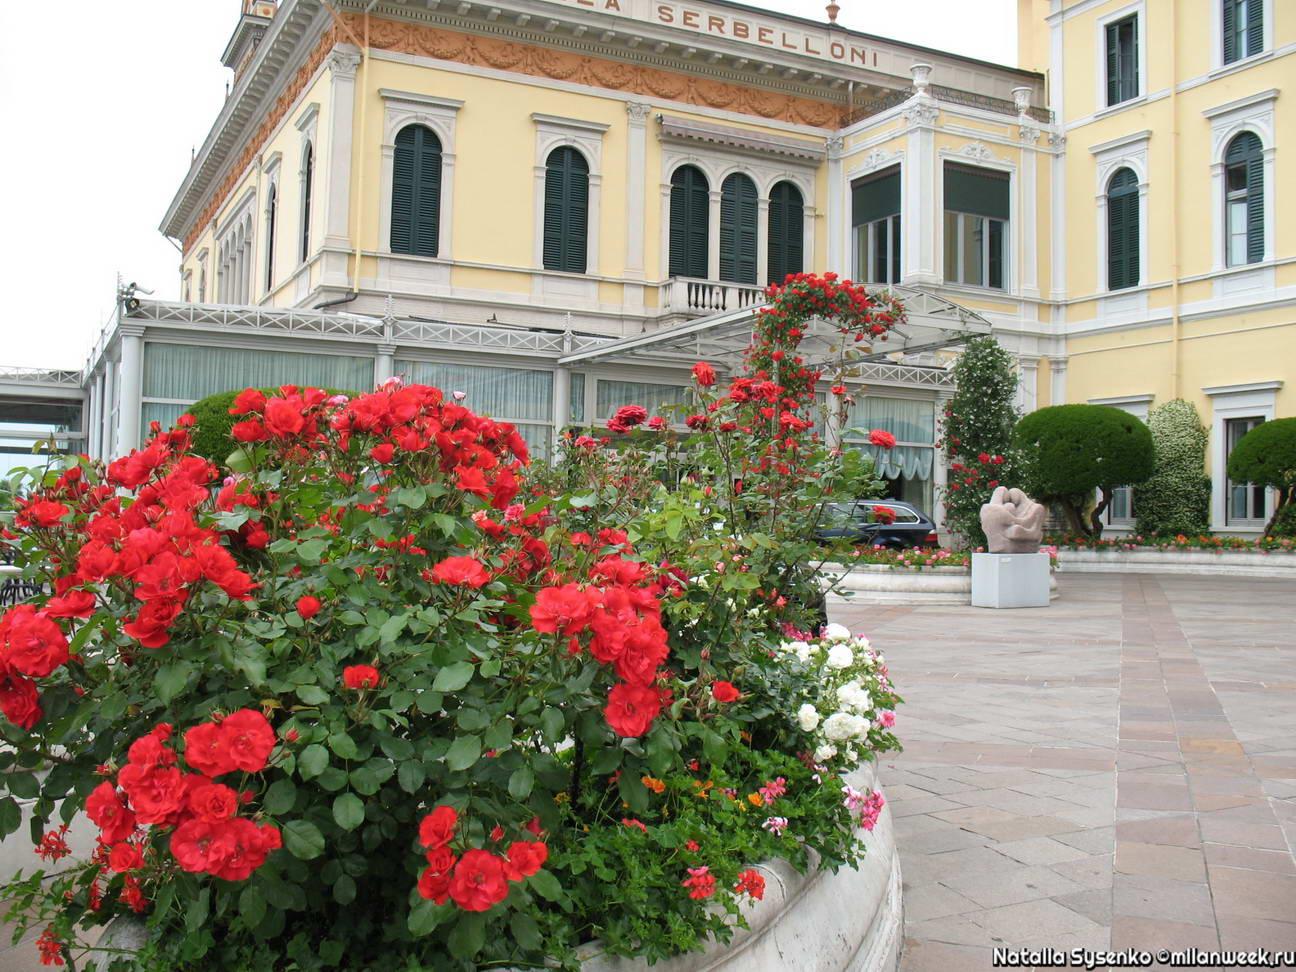 Photo 2 Bellagio grand Hotel Villa Serbelloni - Озеро Комо в мировом кинематографе. Часть 1